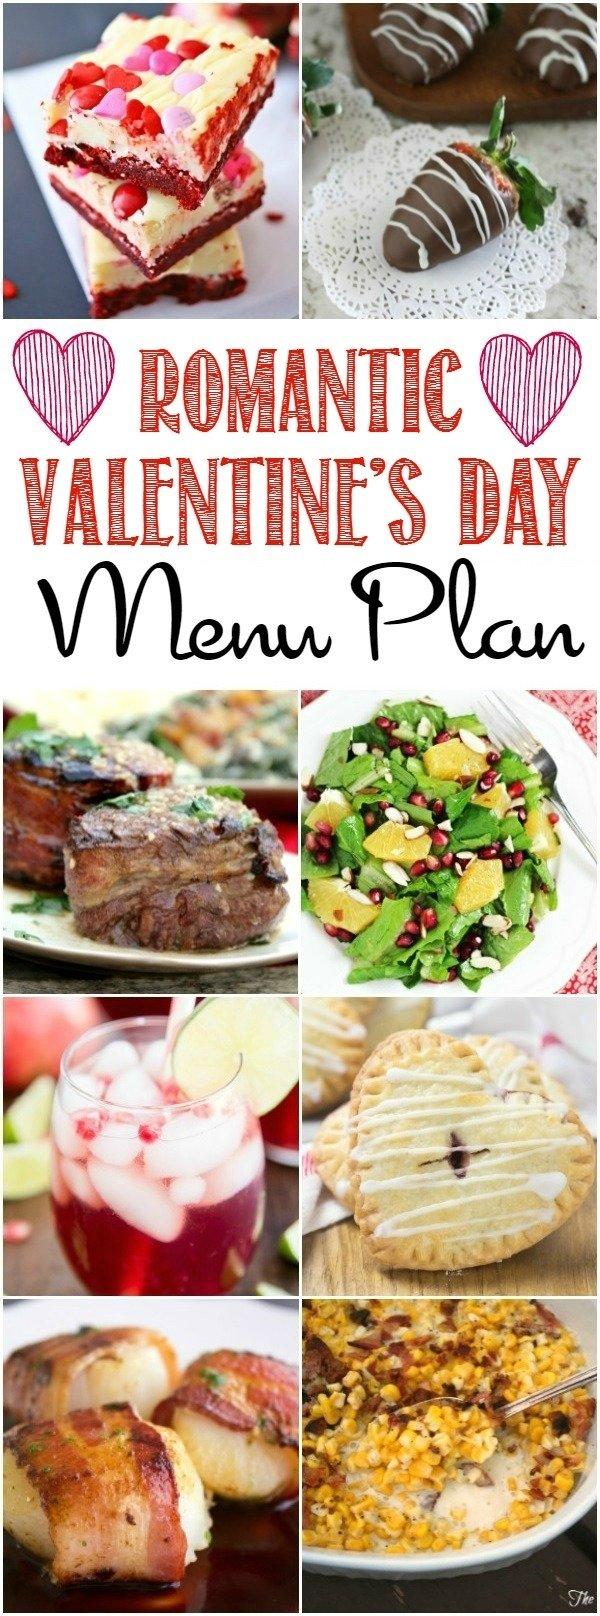 10 Stylish Romantic Valentines Day Dinner Ideas romantic valentines day menu plan bread booze bacon 2021